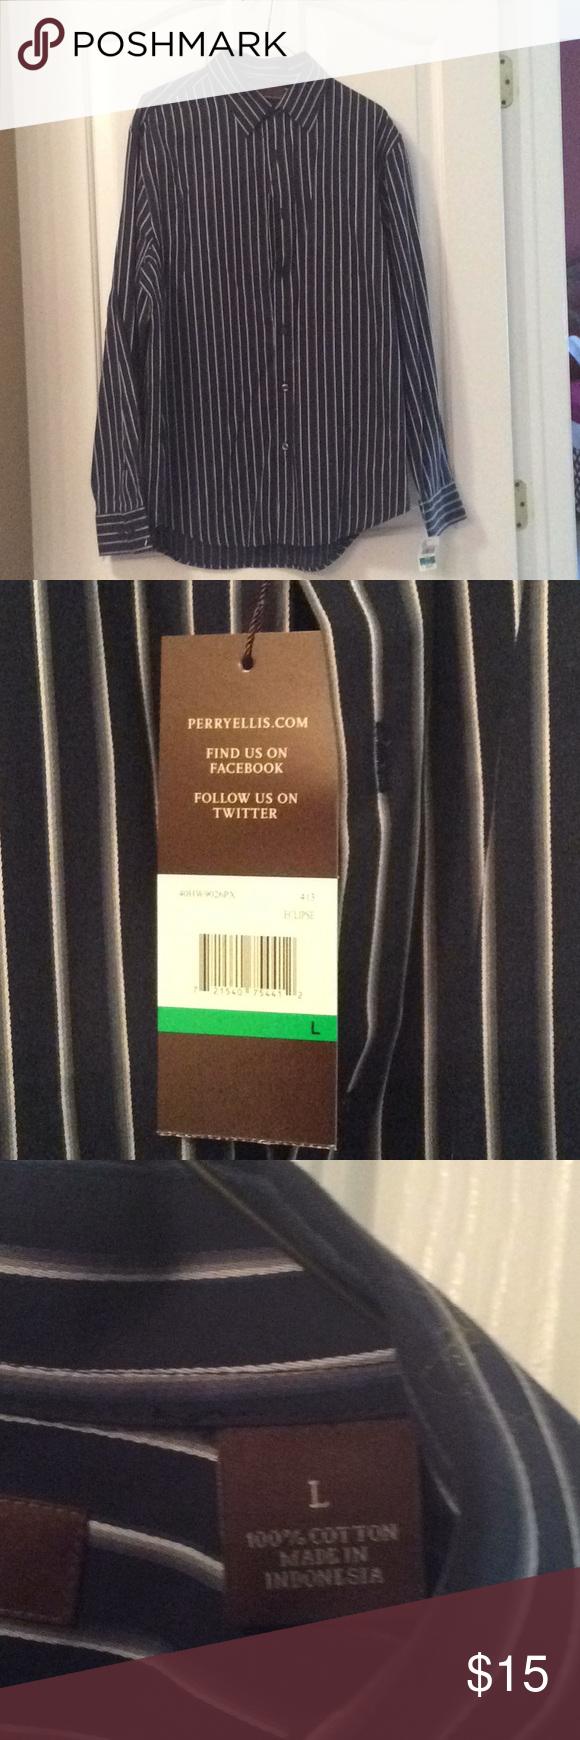 Nwt Perry Ellis Men S Shirt Size L Shirt Size Perry Ellis Shirts